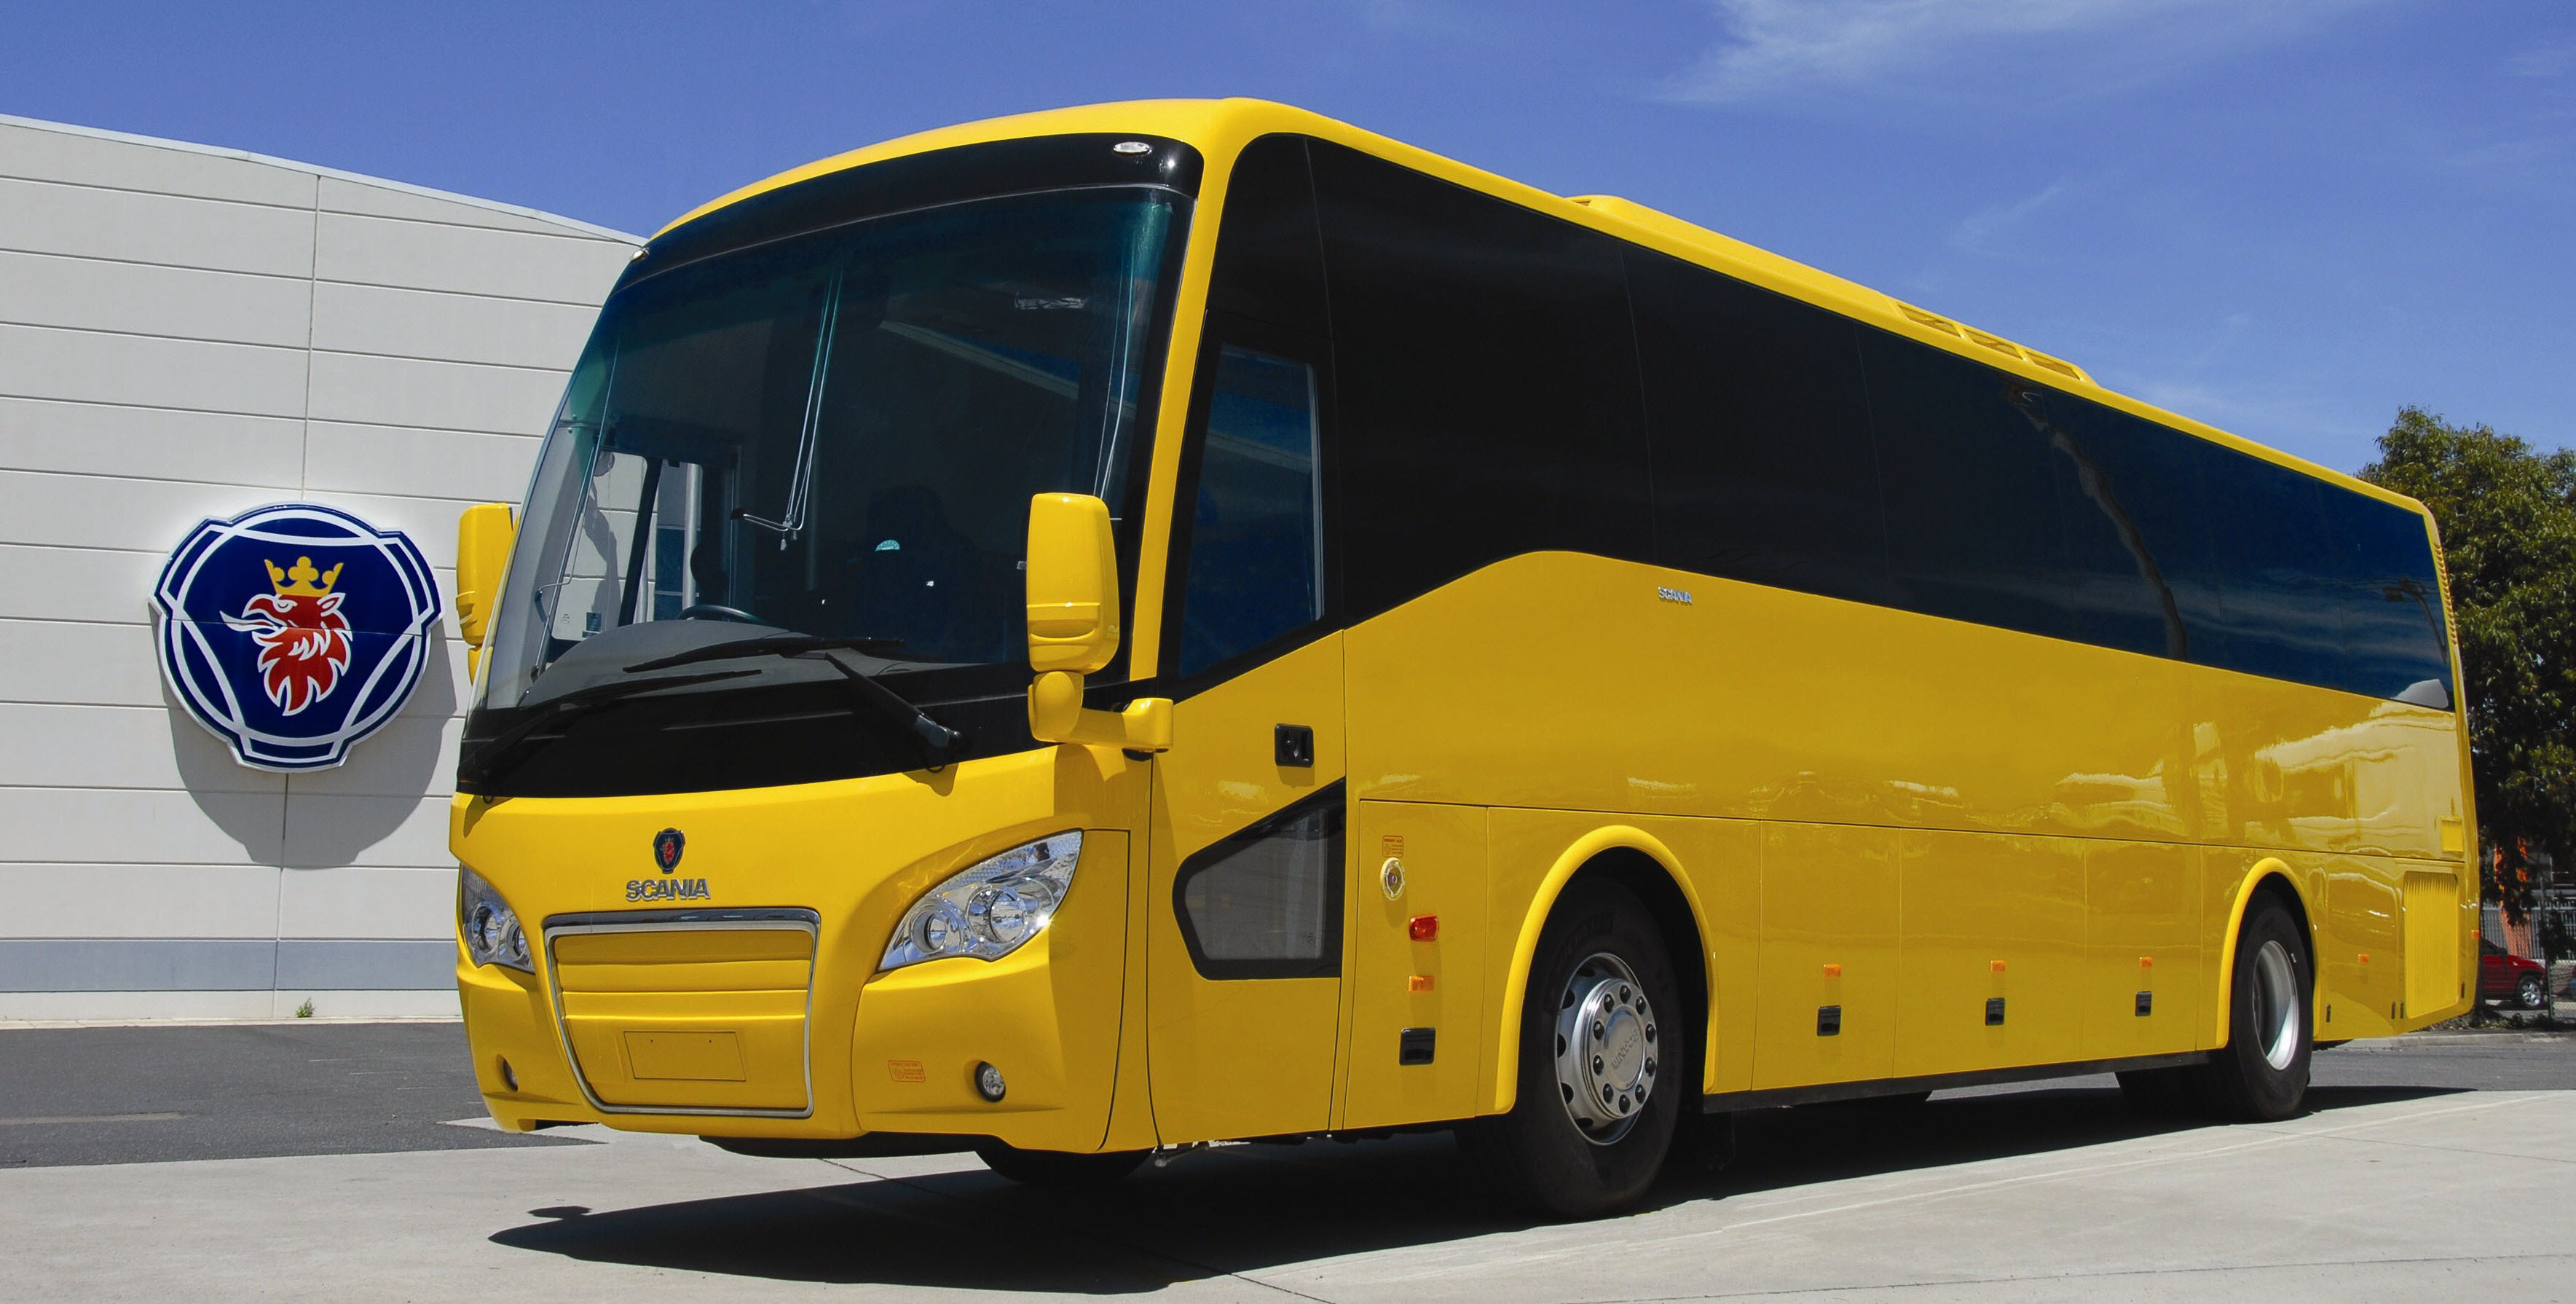 اخرین قیمت اتوبوس مارال اسکانیا جم سرویس